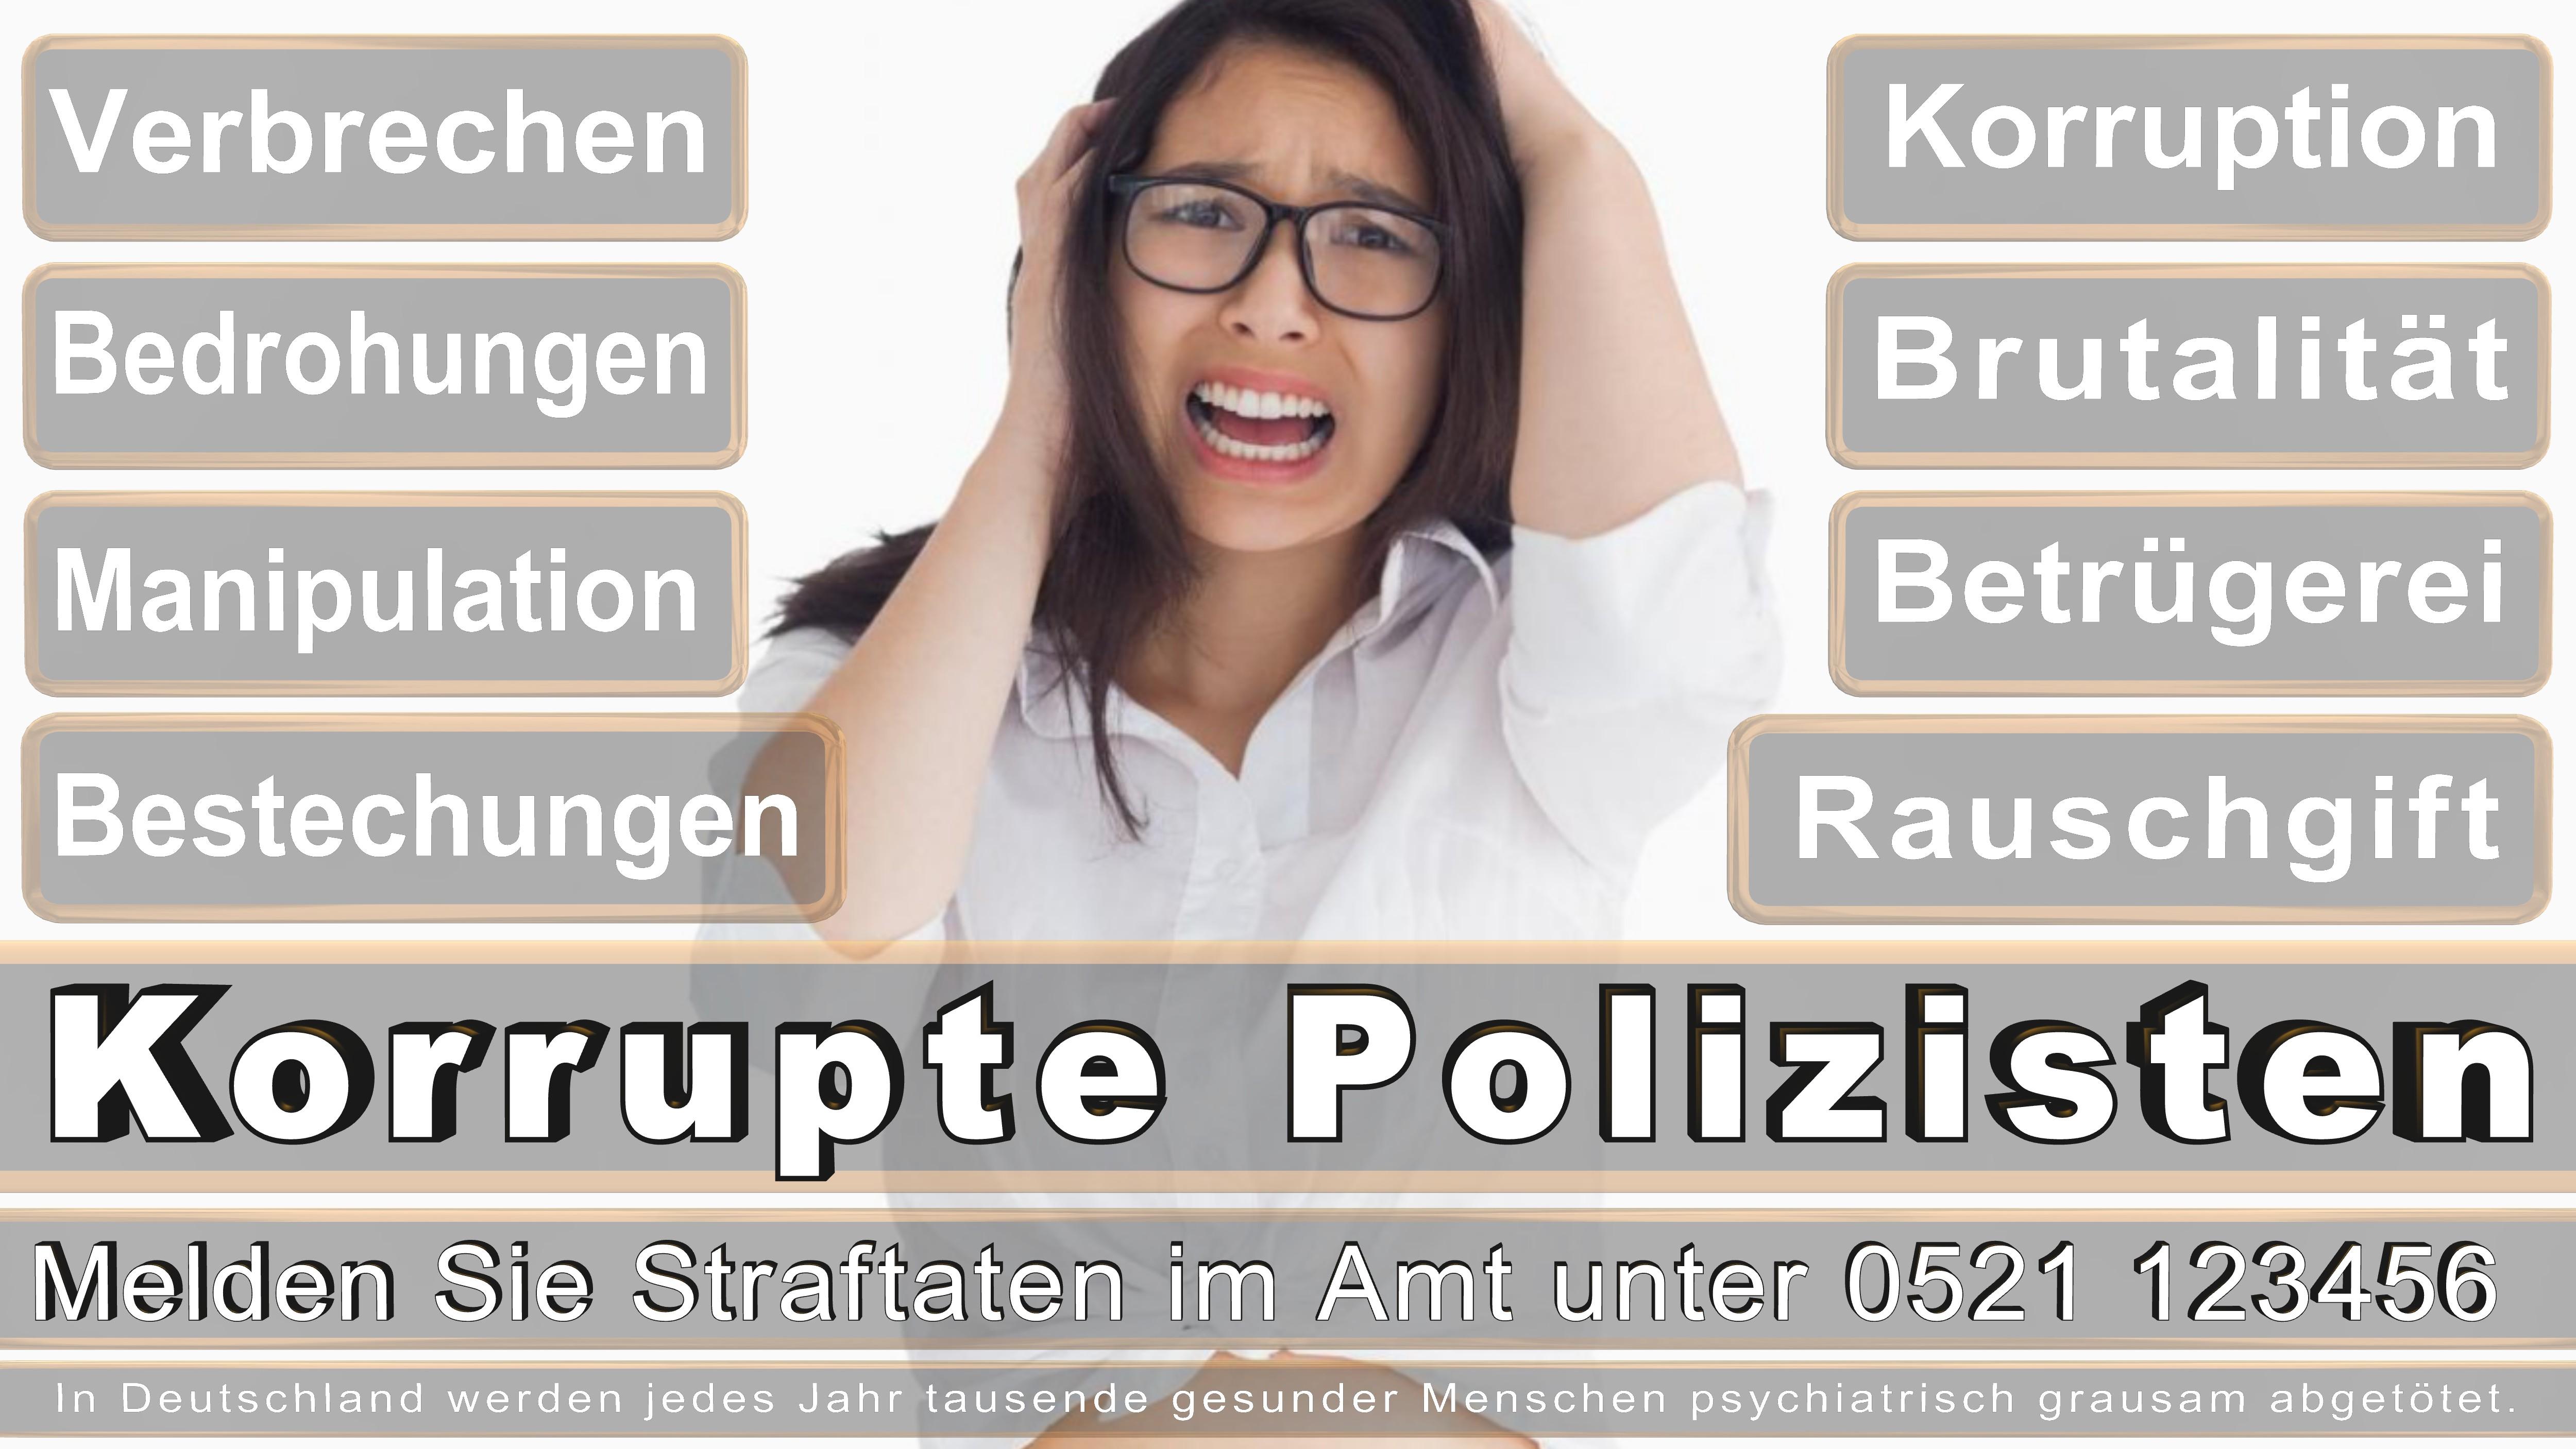 Polizei-Bielefeld-Polizei-Bielefeld-Polizei-Bielefeld (187)